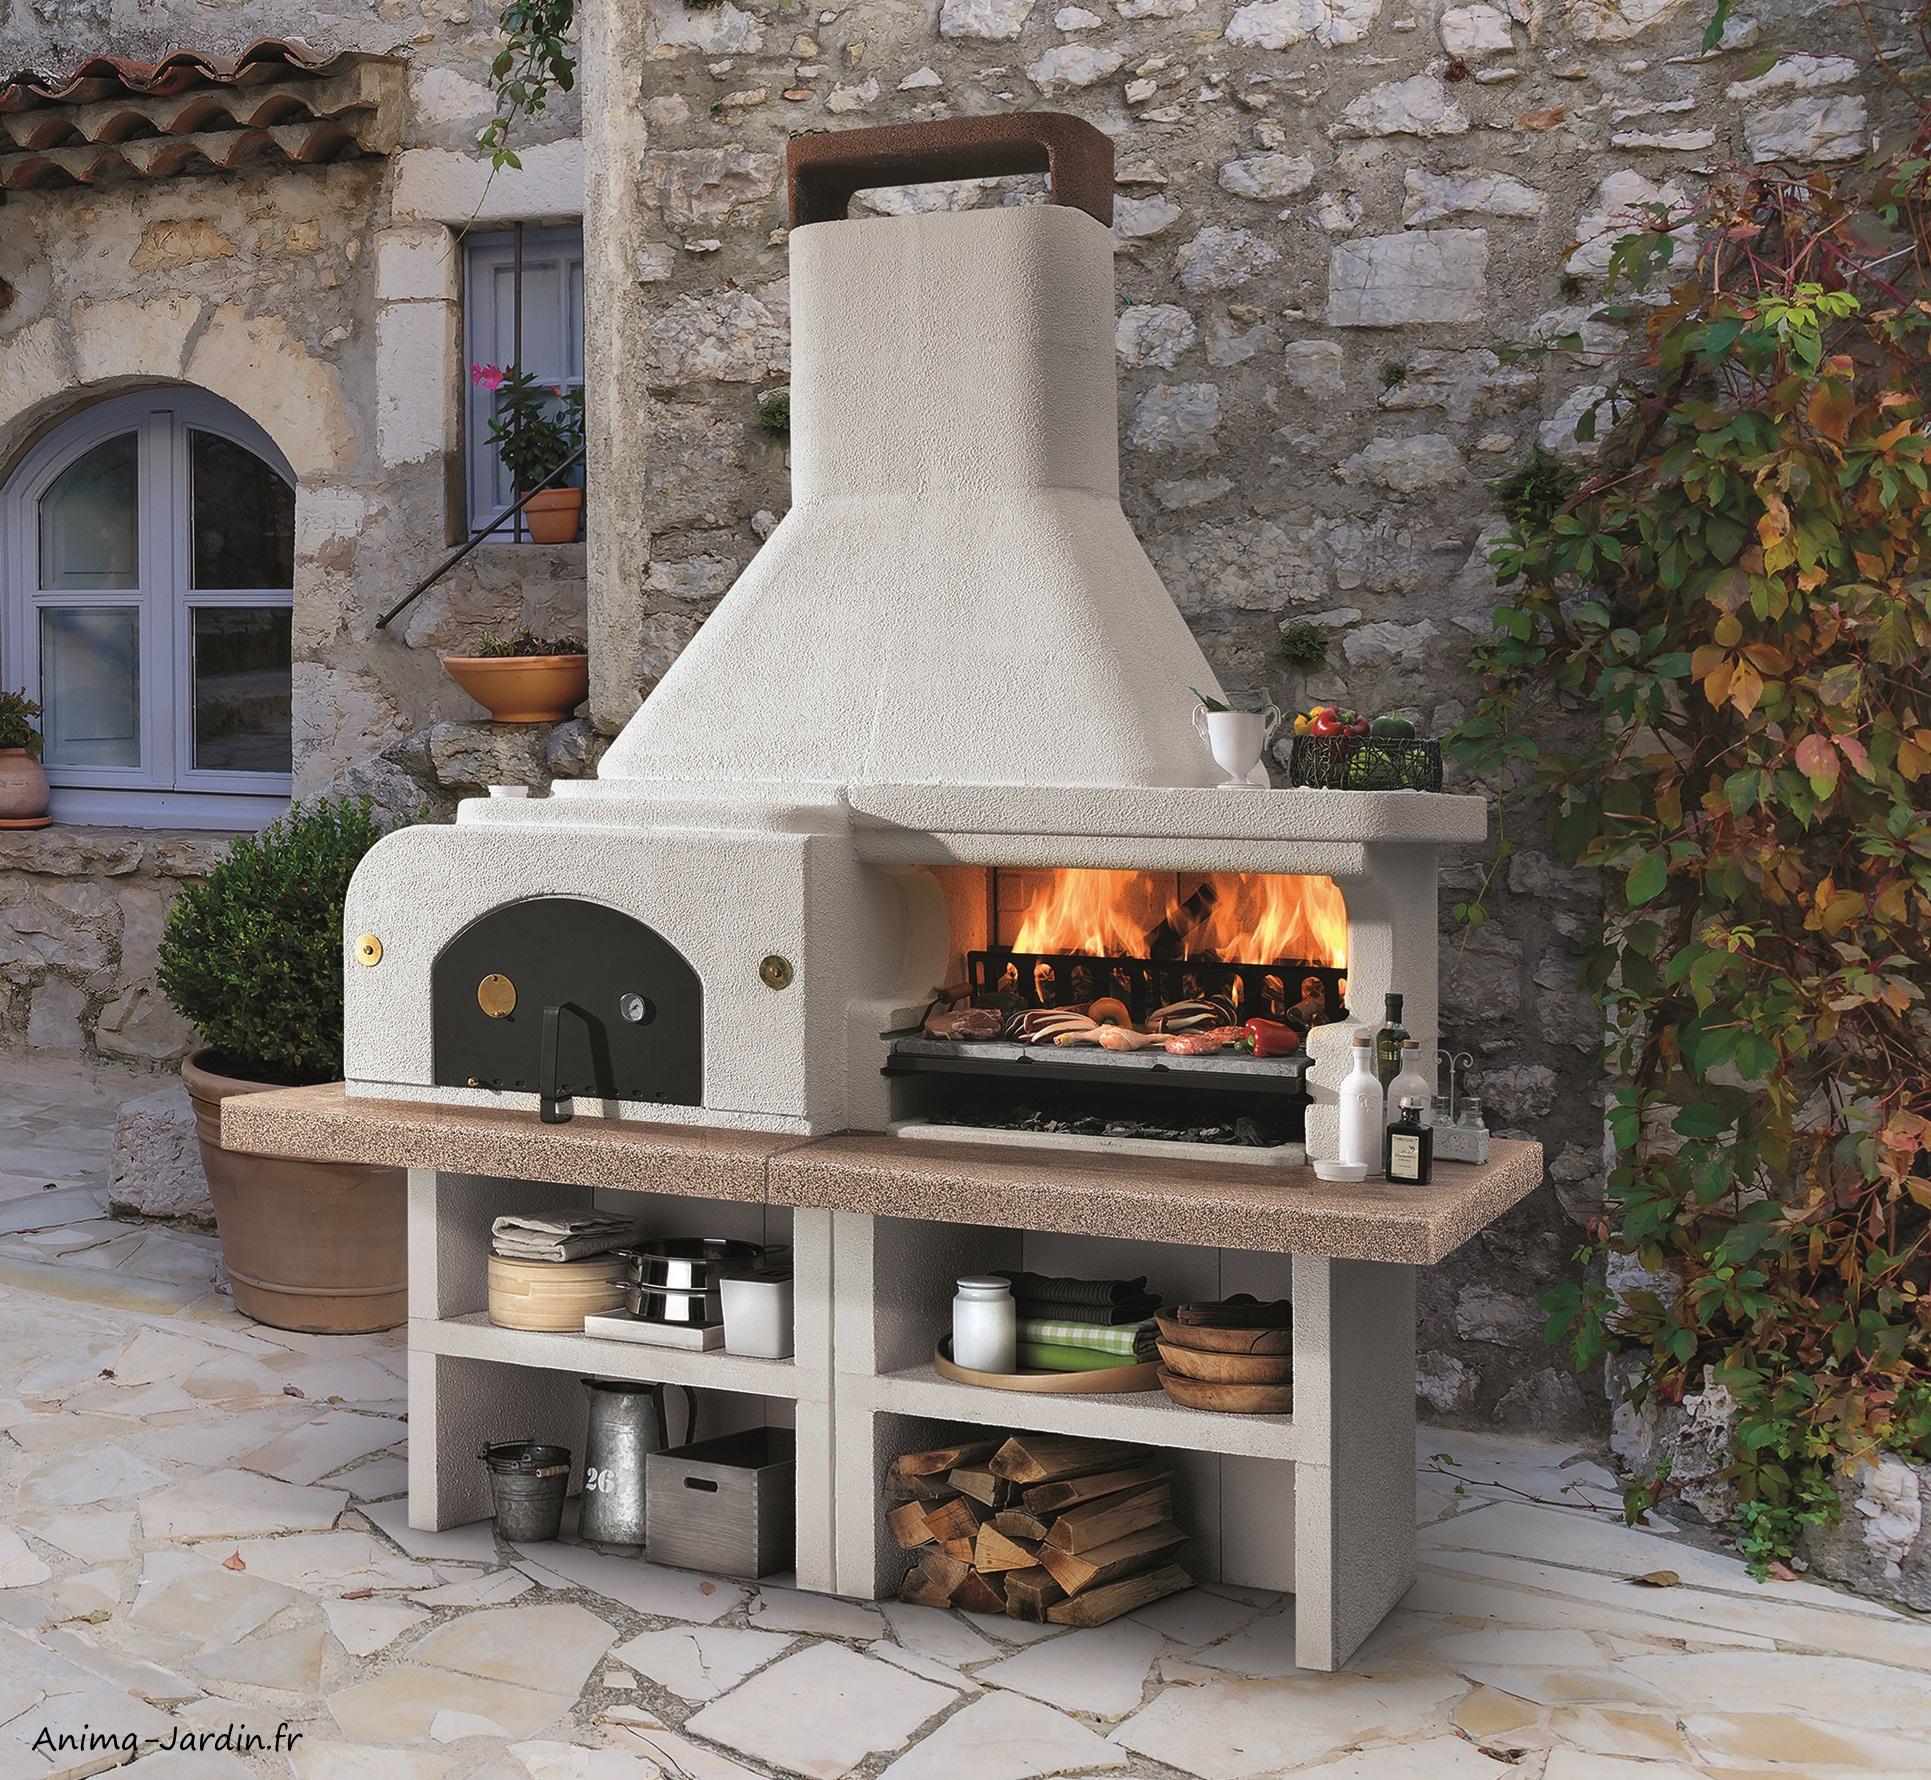 Barbecue en pierre-four-Gargano 3-marmotech-charbon de bois-Palazzetti-Anima-Jardin.fr